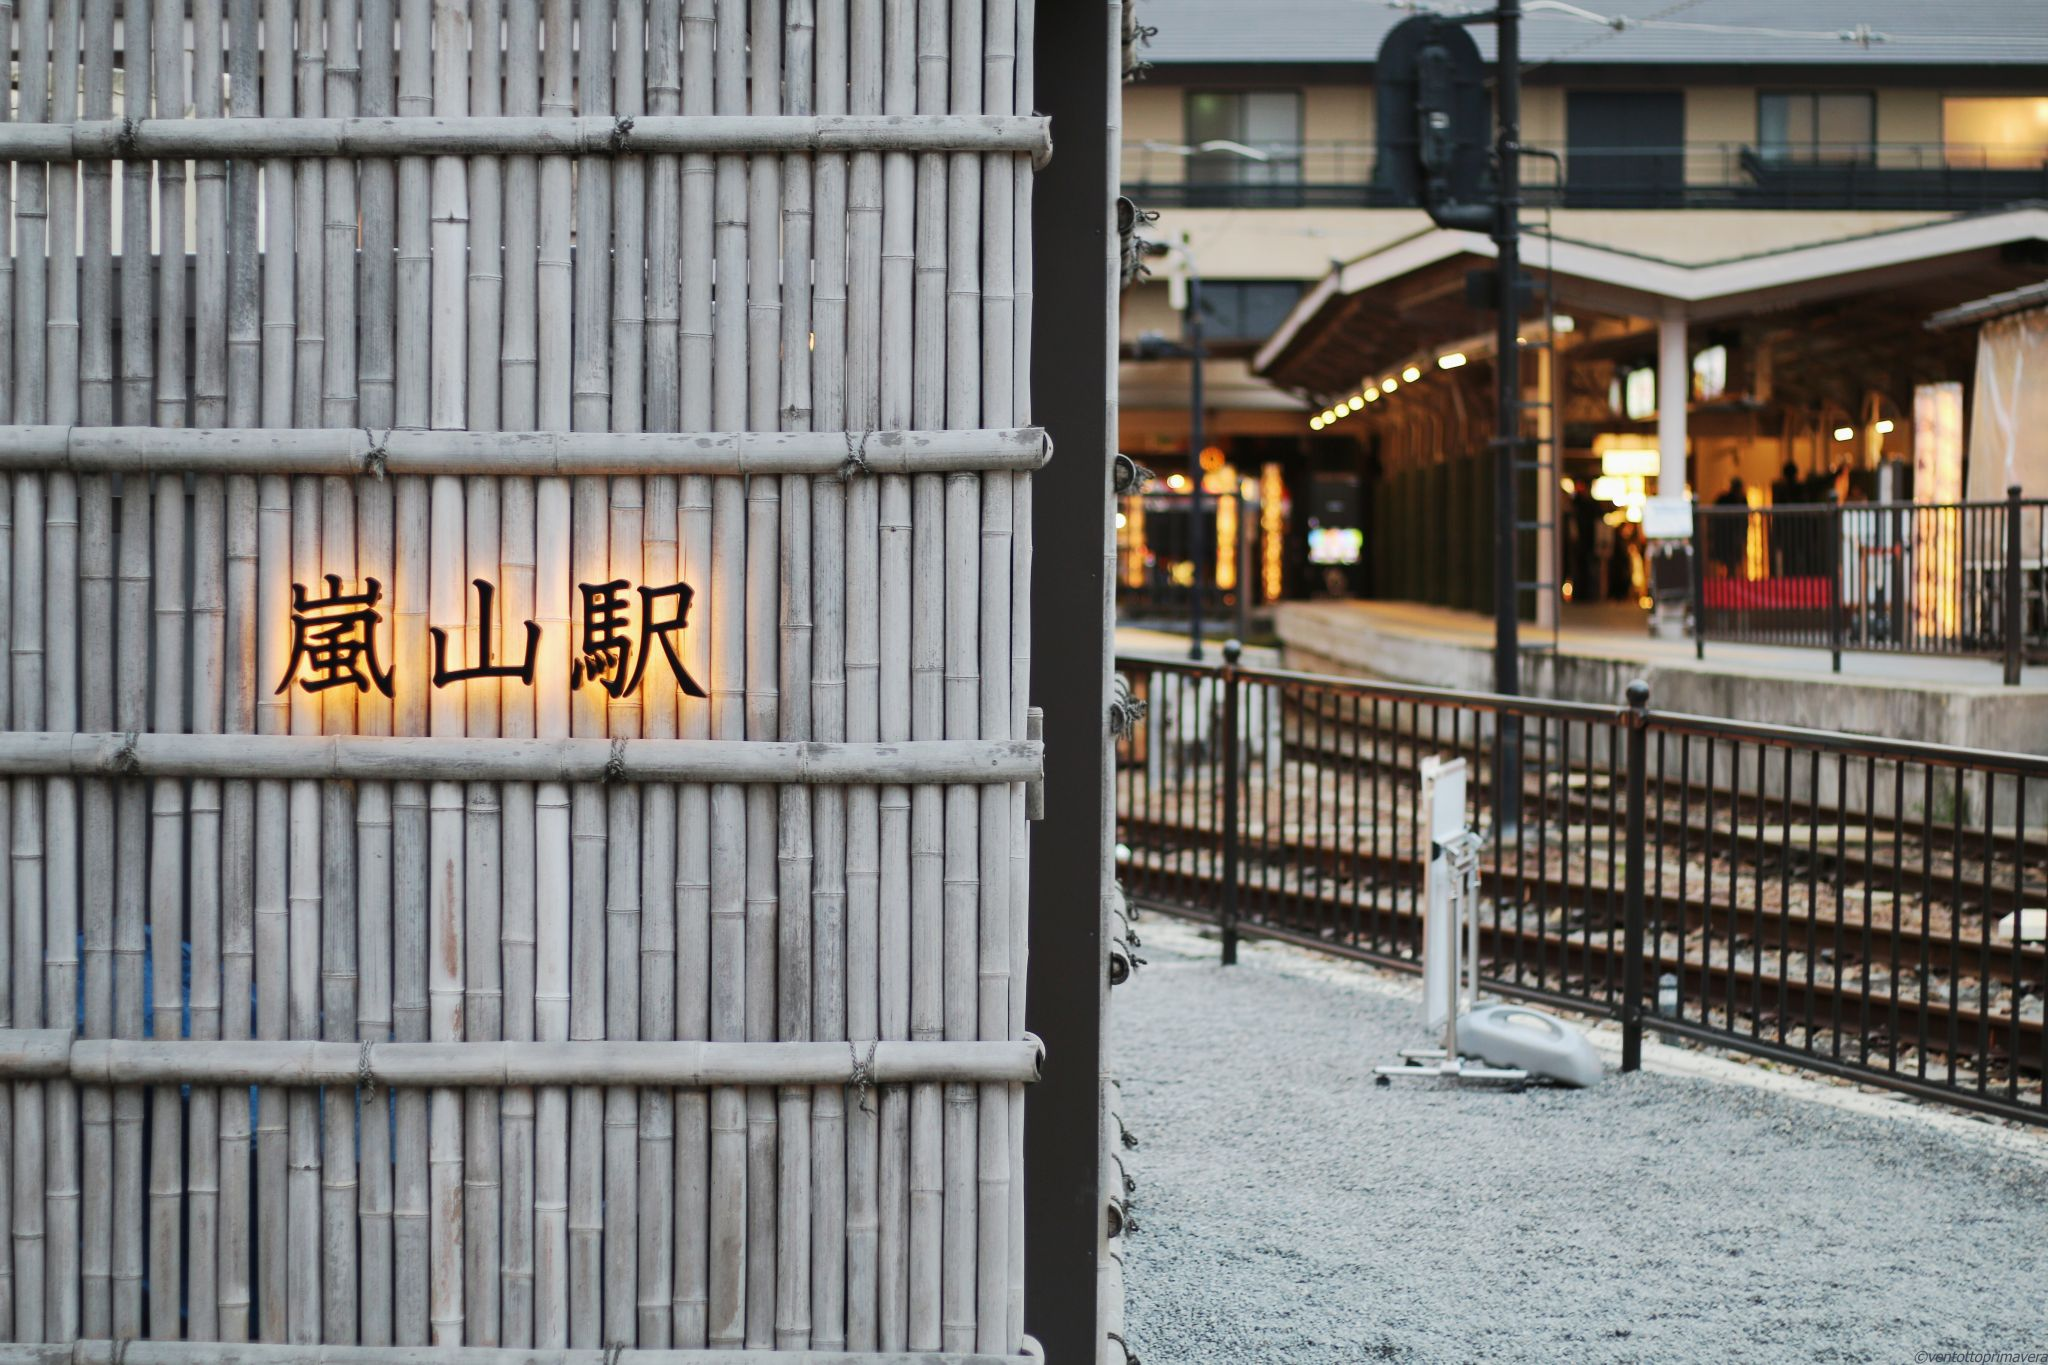 Randen Arashiyama Station name on bamboo fense, Japan